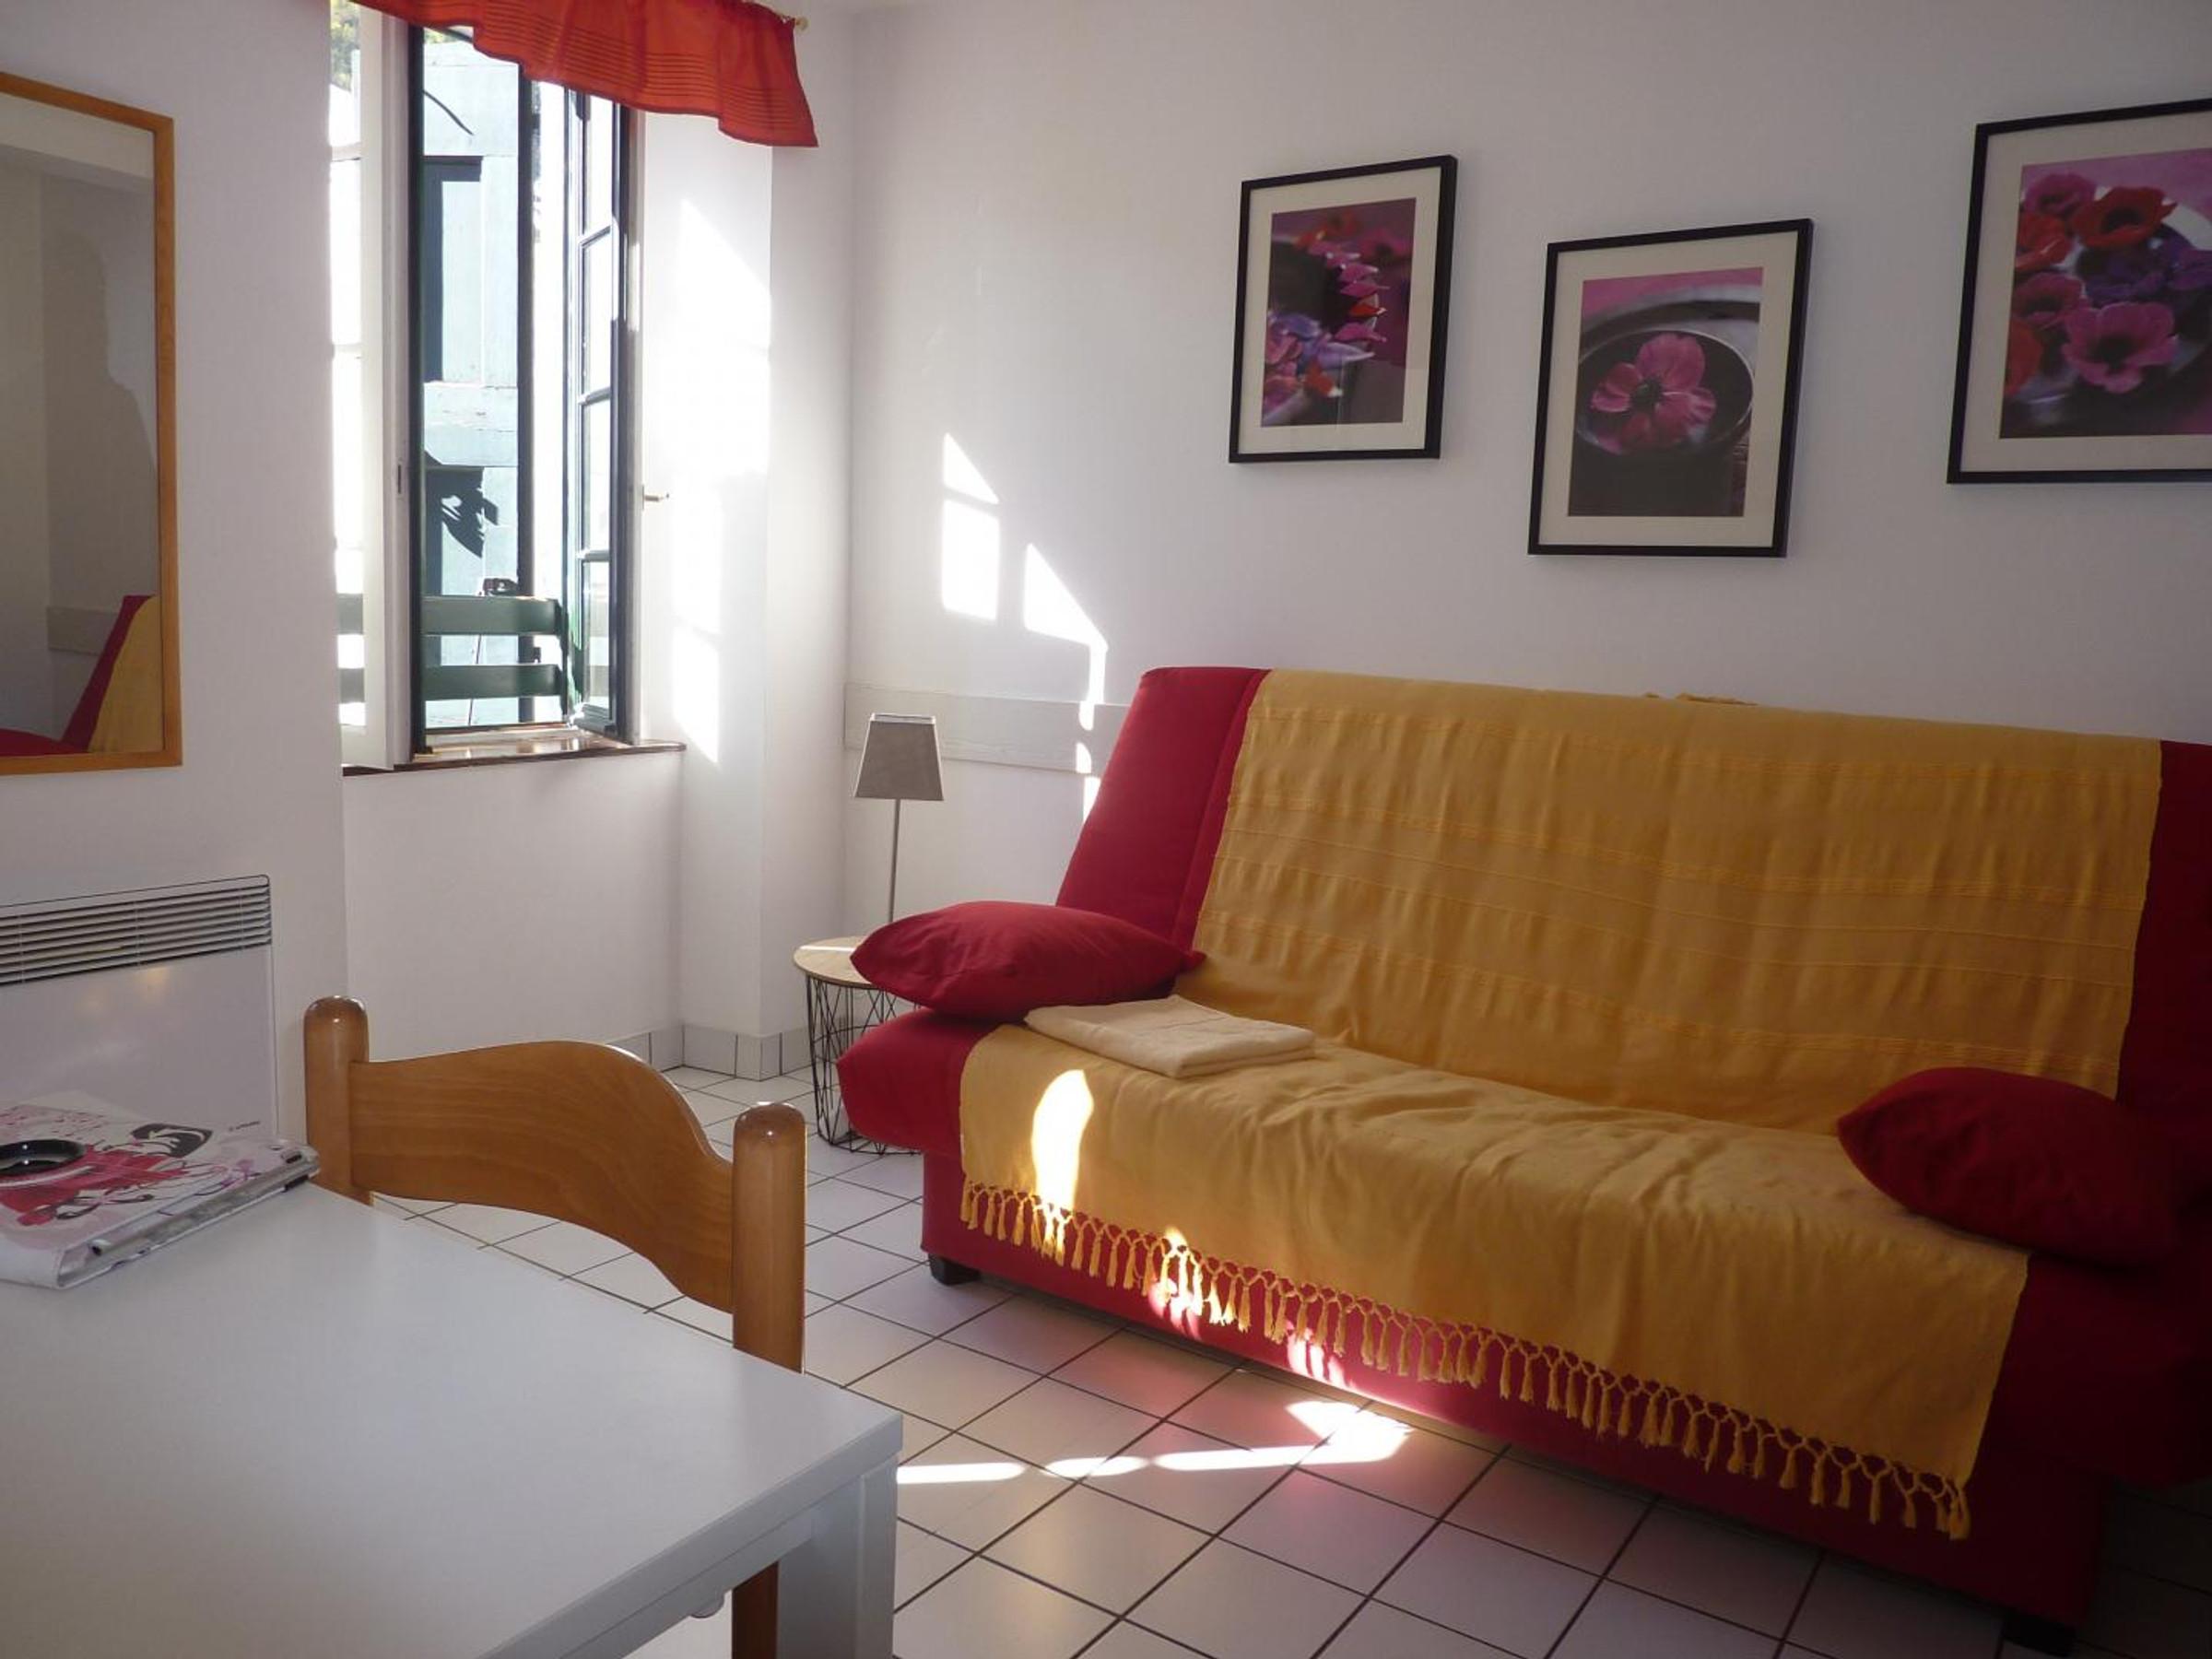 Appartement Coquelicots